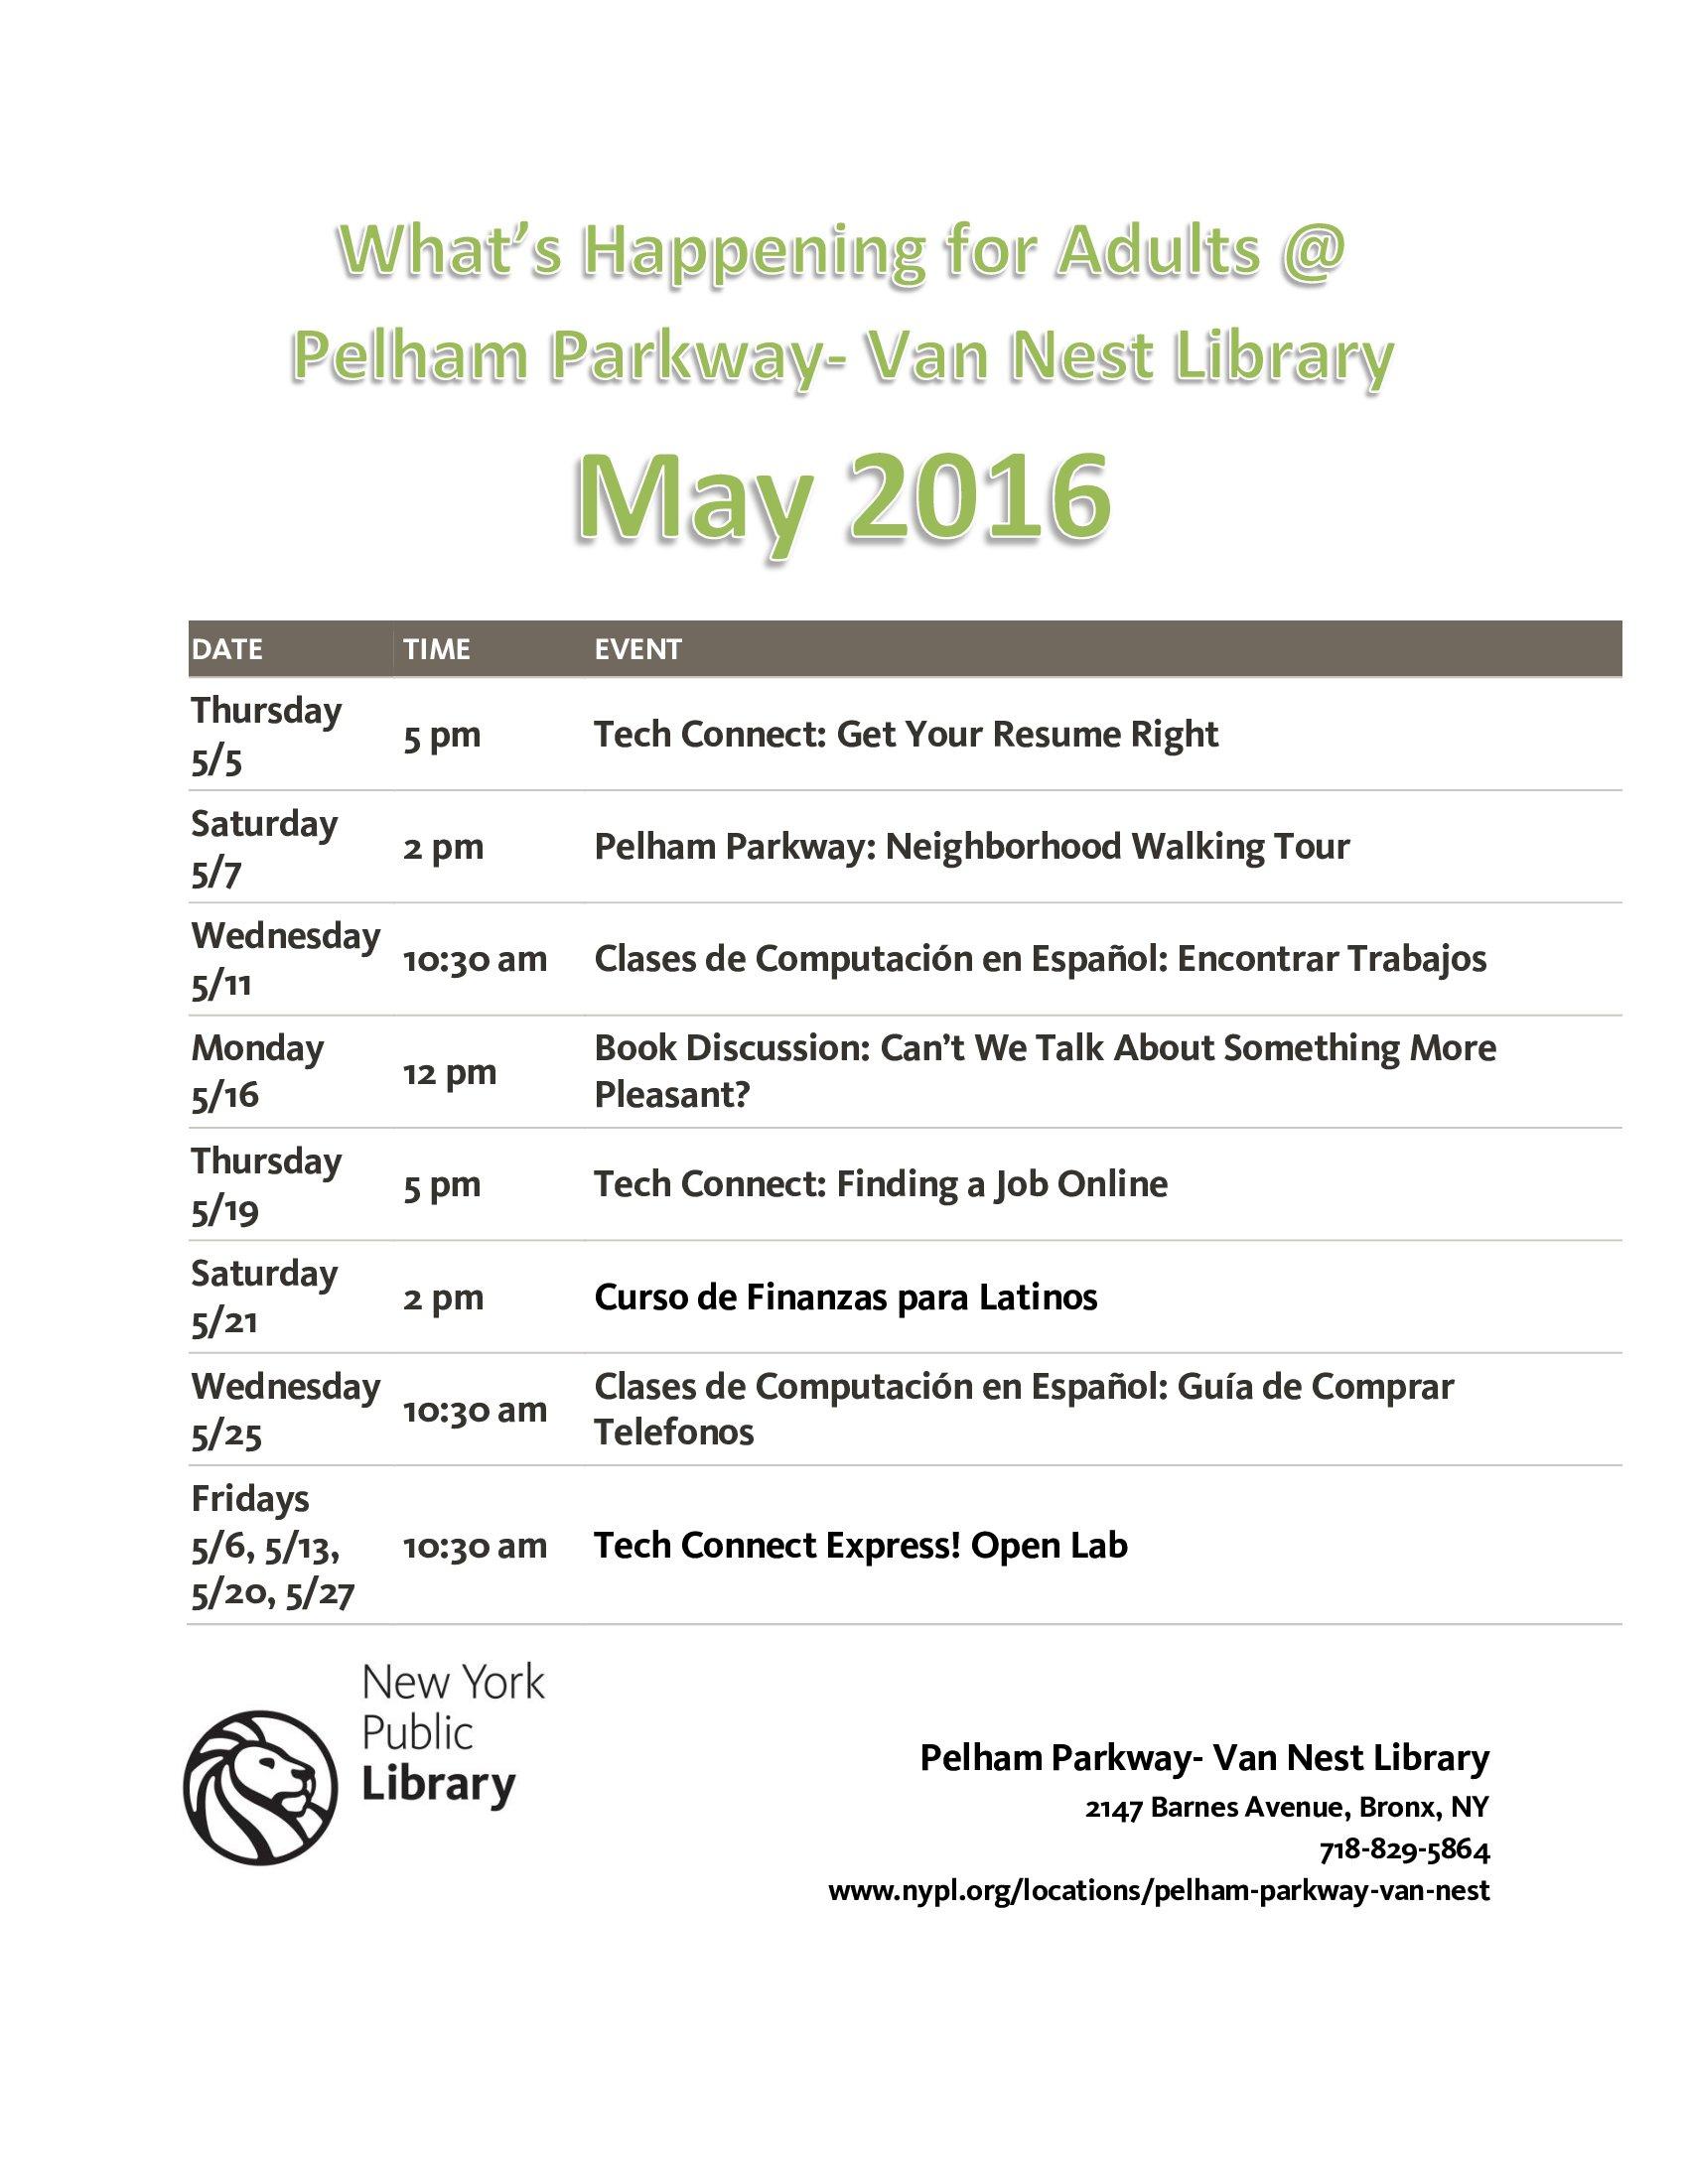 PPVN-adult-calendar-may-2016